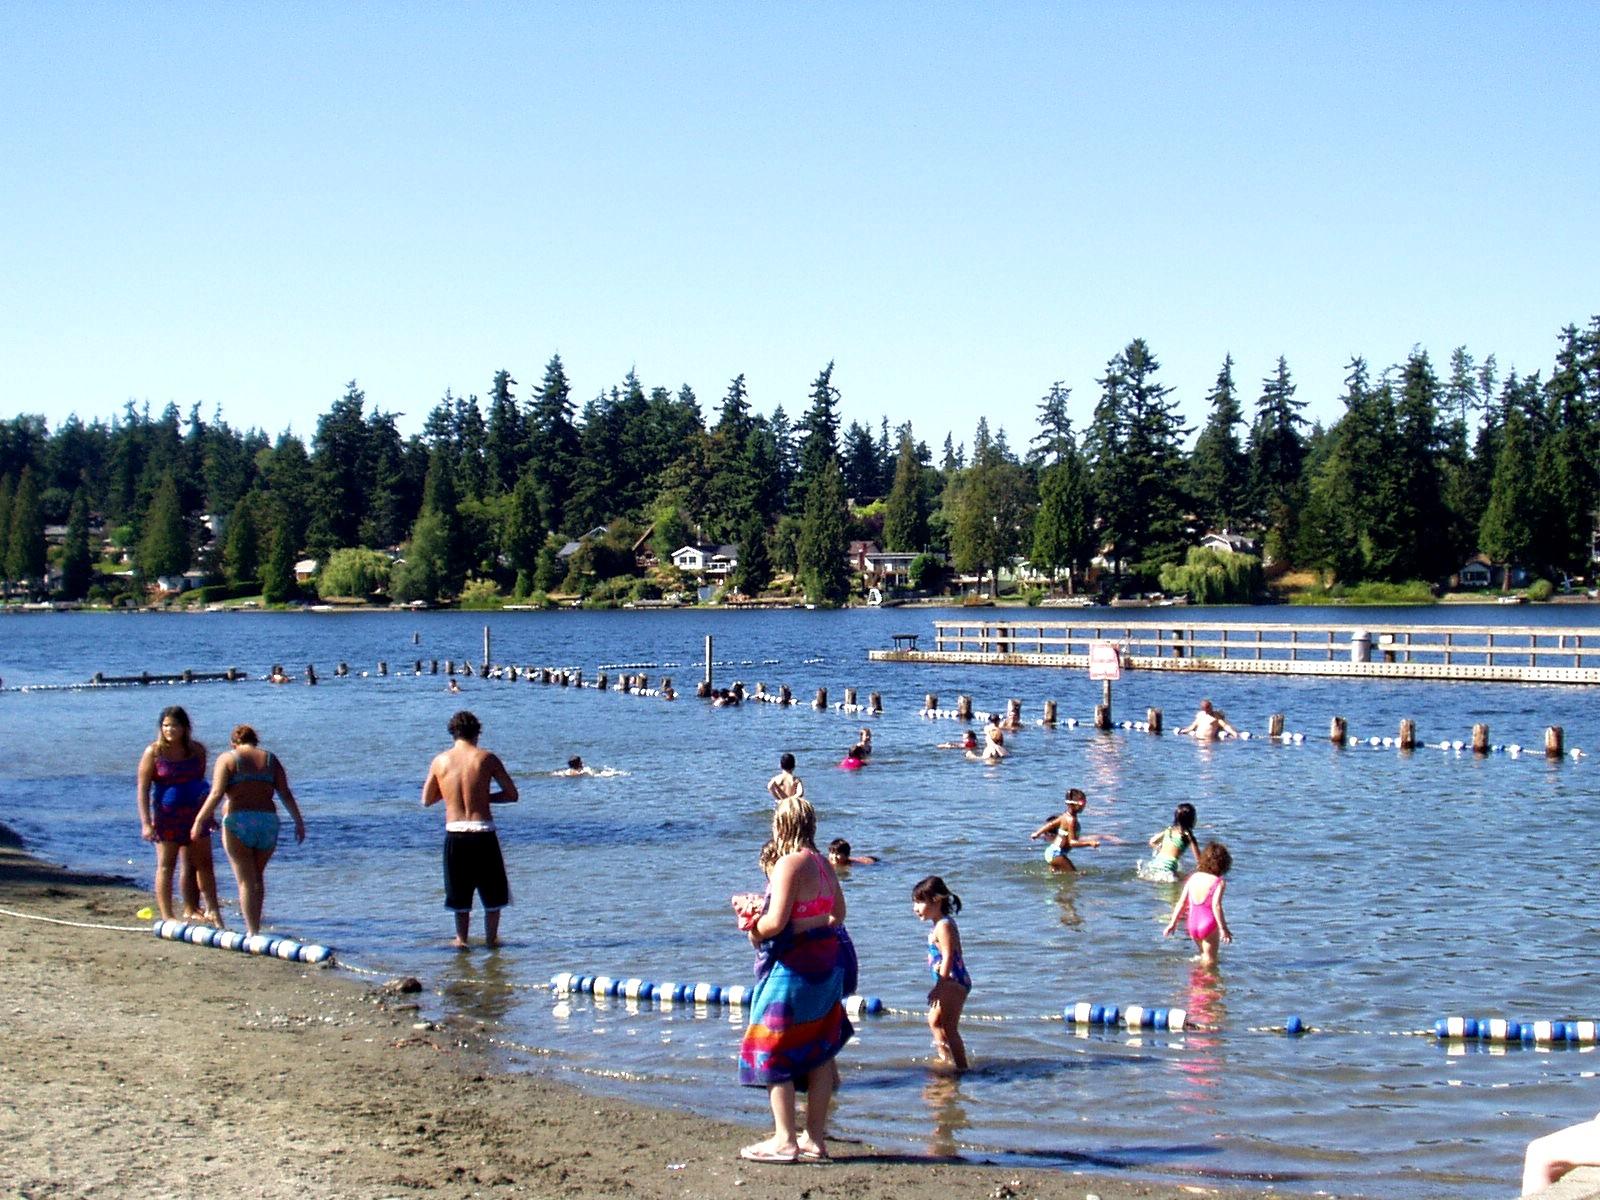 Steel Lake Park : Steel lake park family funland federal way tourism